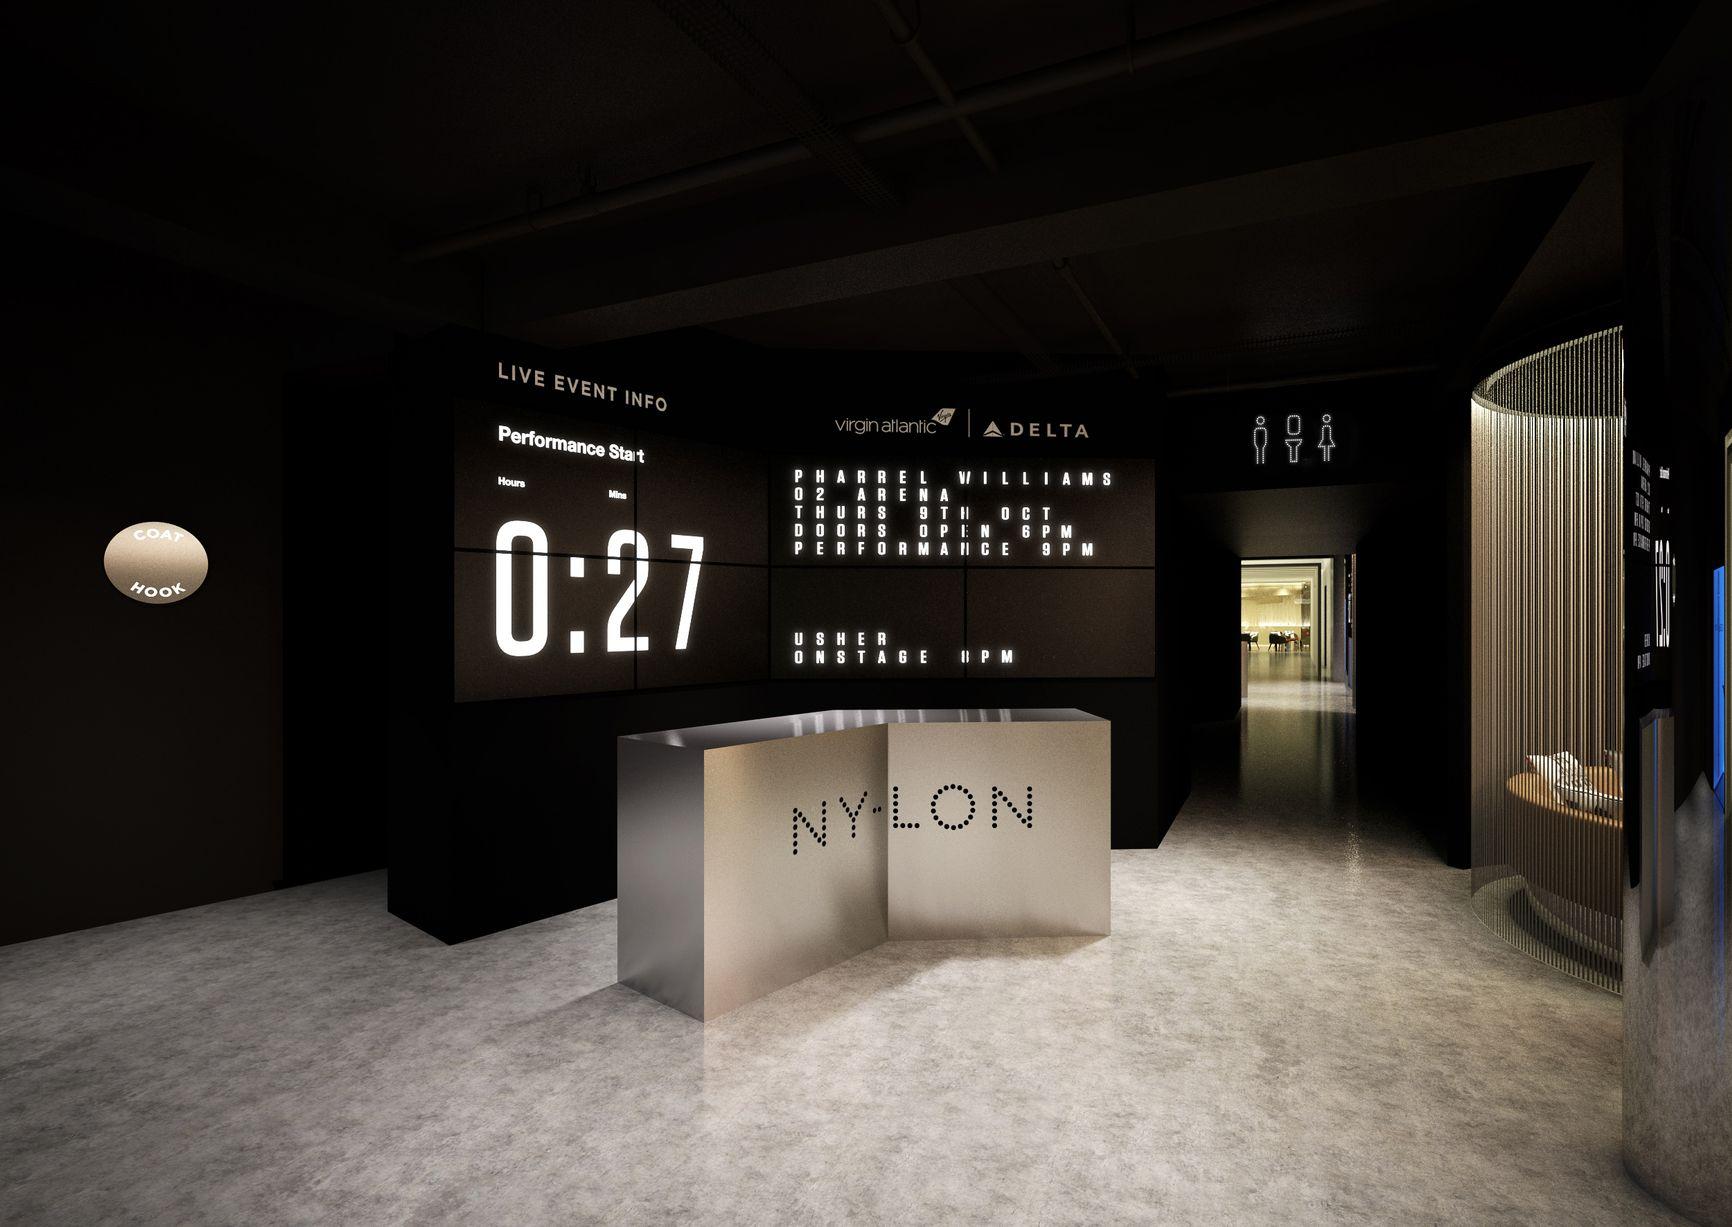 NY-LON_Lounge_bar_Delta_Virgin_Reception